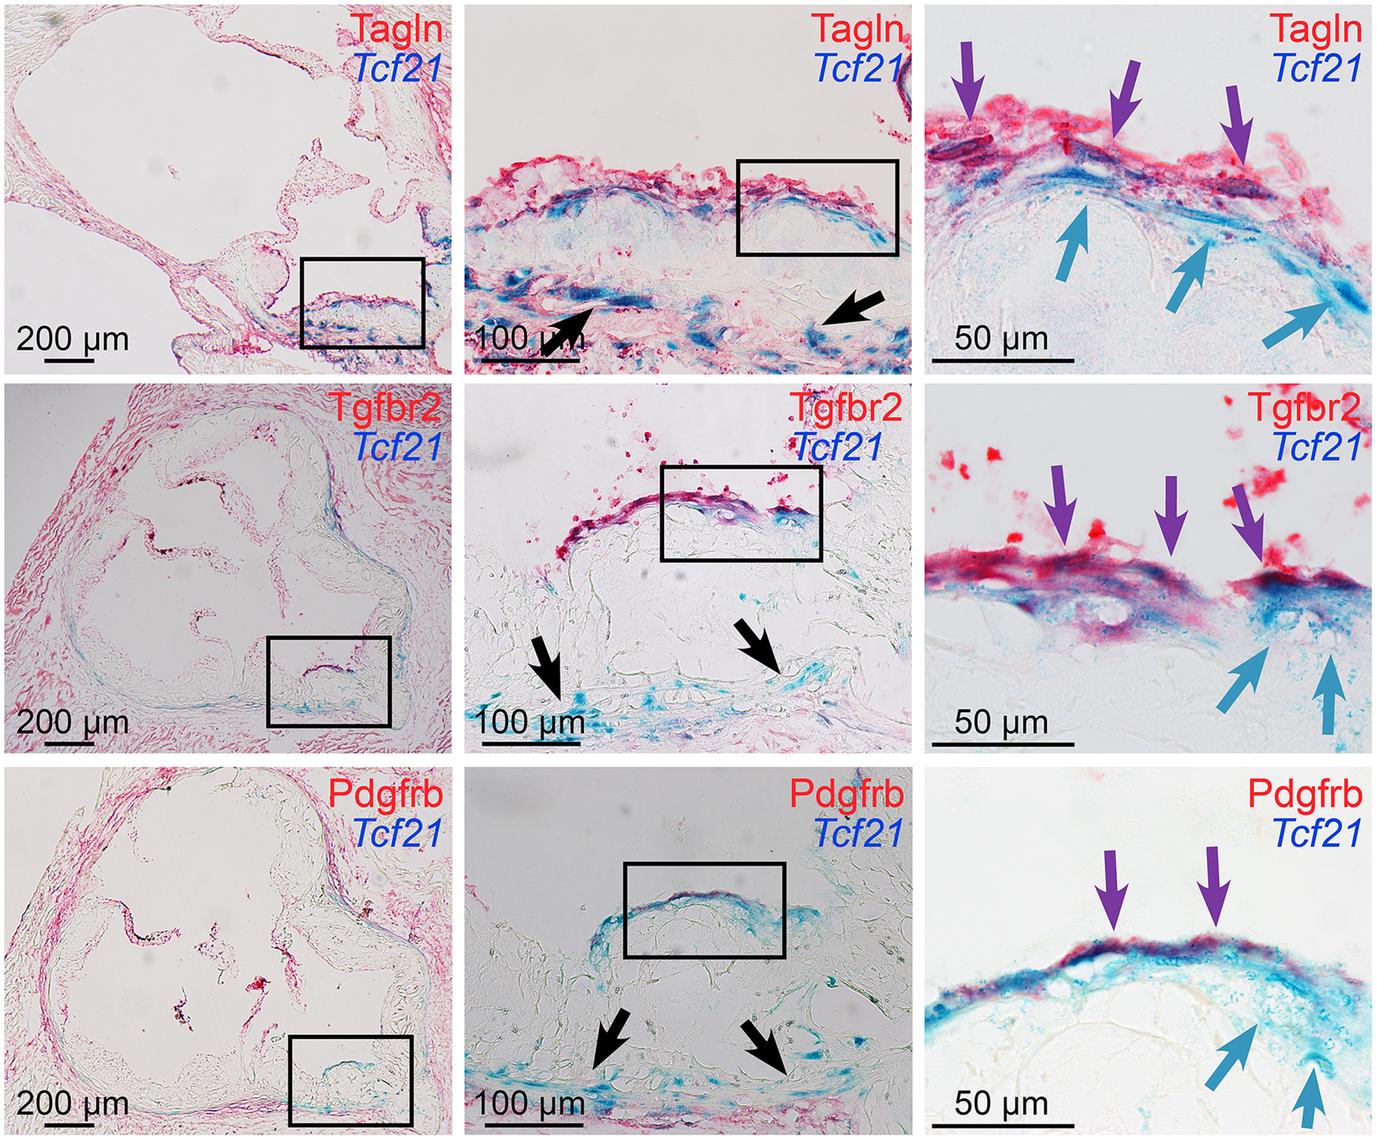 <i>Tcf21</i> expressing cells associate with the fibrous cap.